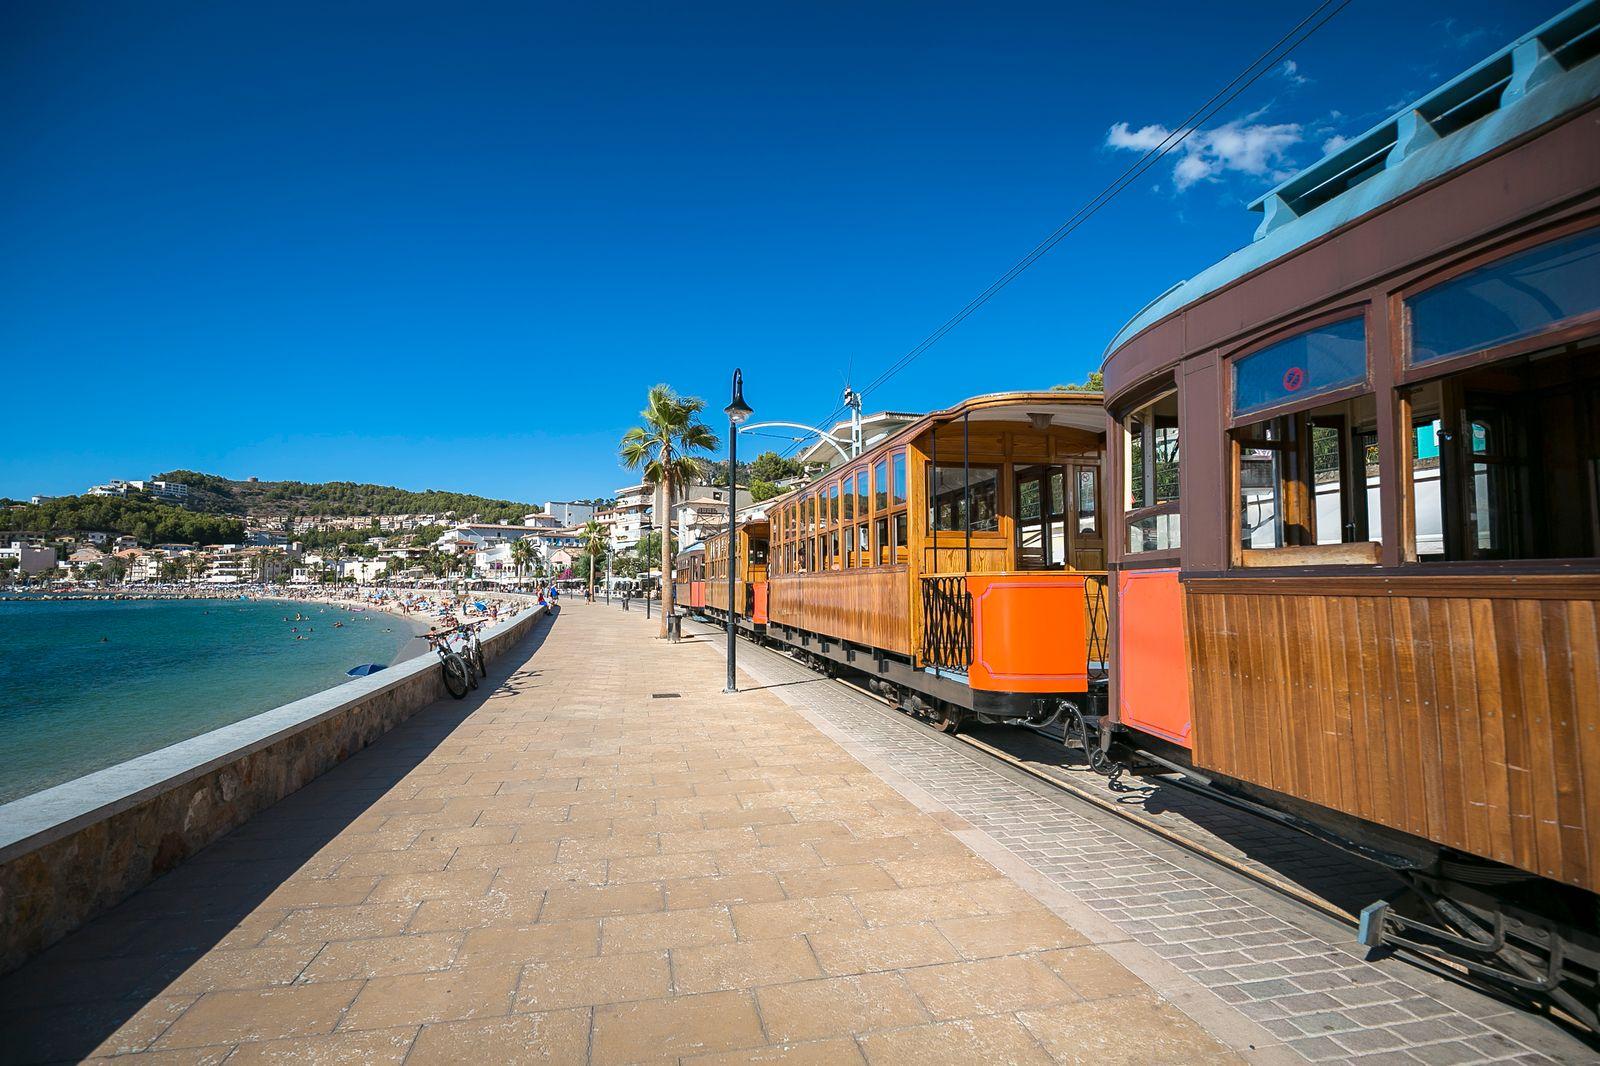 Tramway in Port De Soller, Majorka